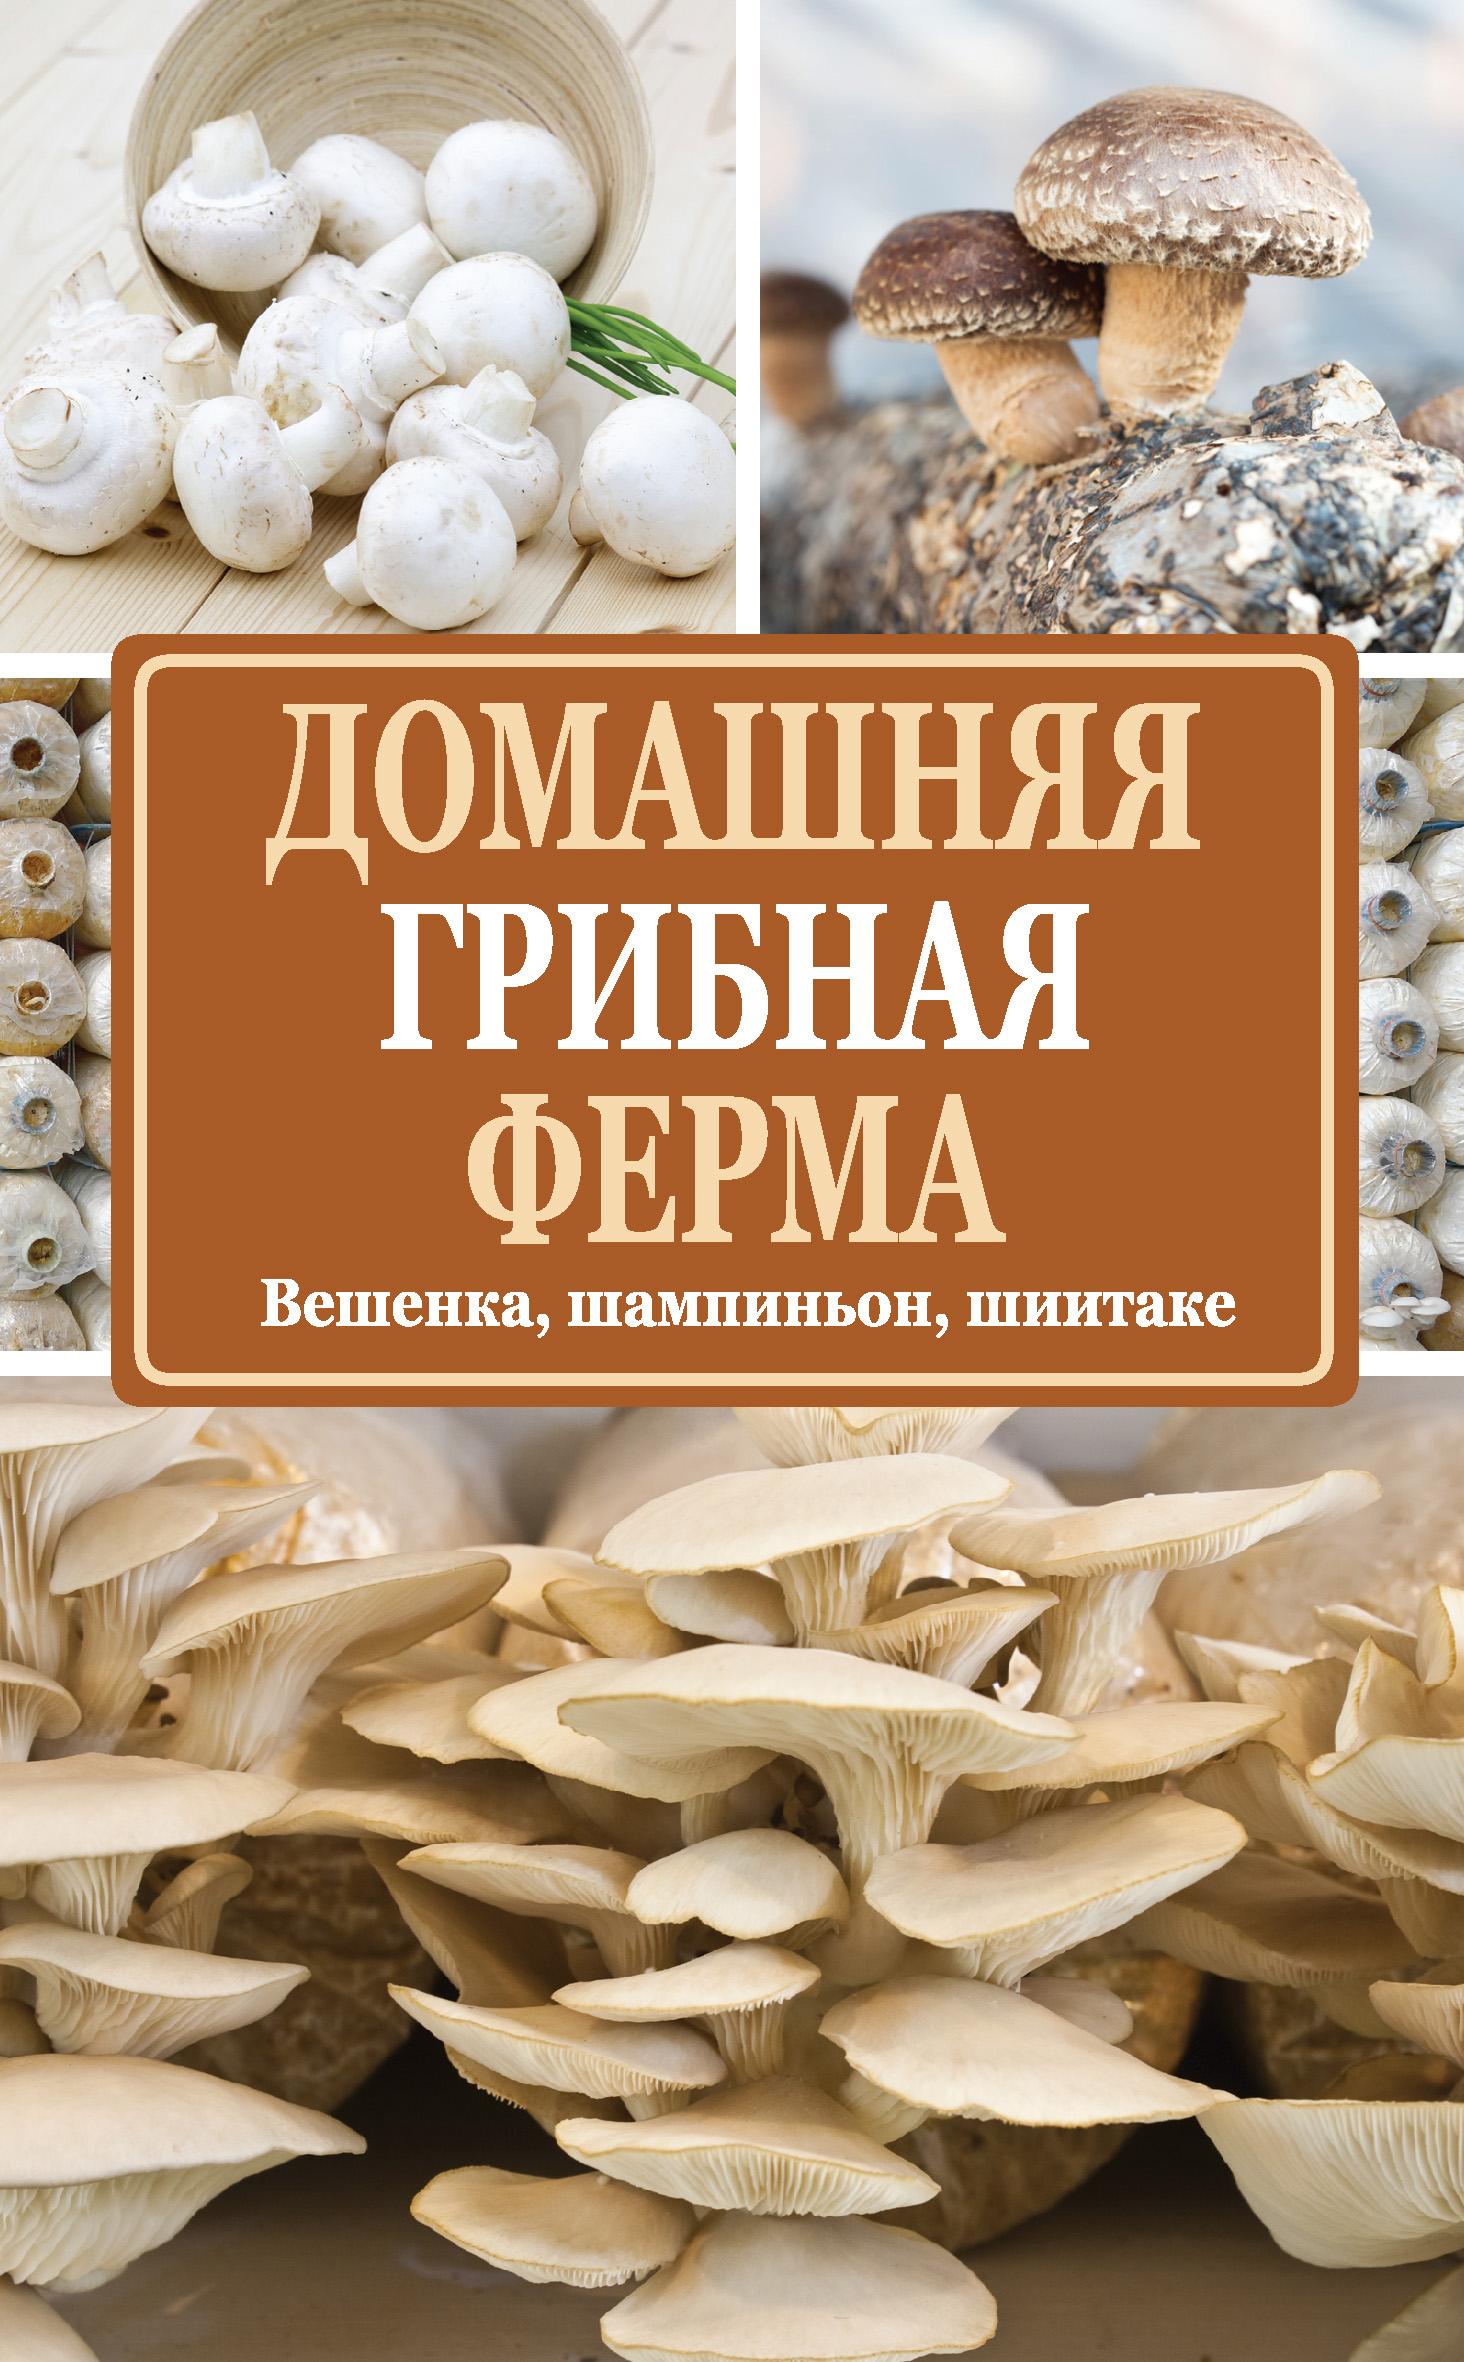 Нина Богданова Домашняя грибная ферма. Вешенка, шампиньон,